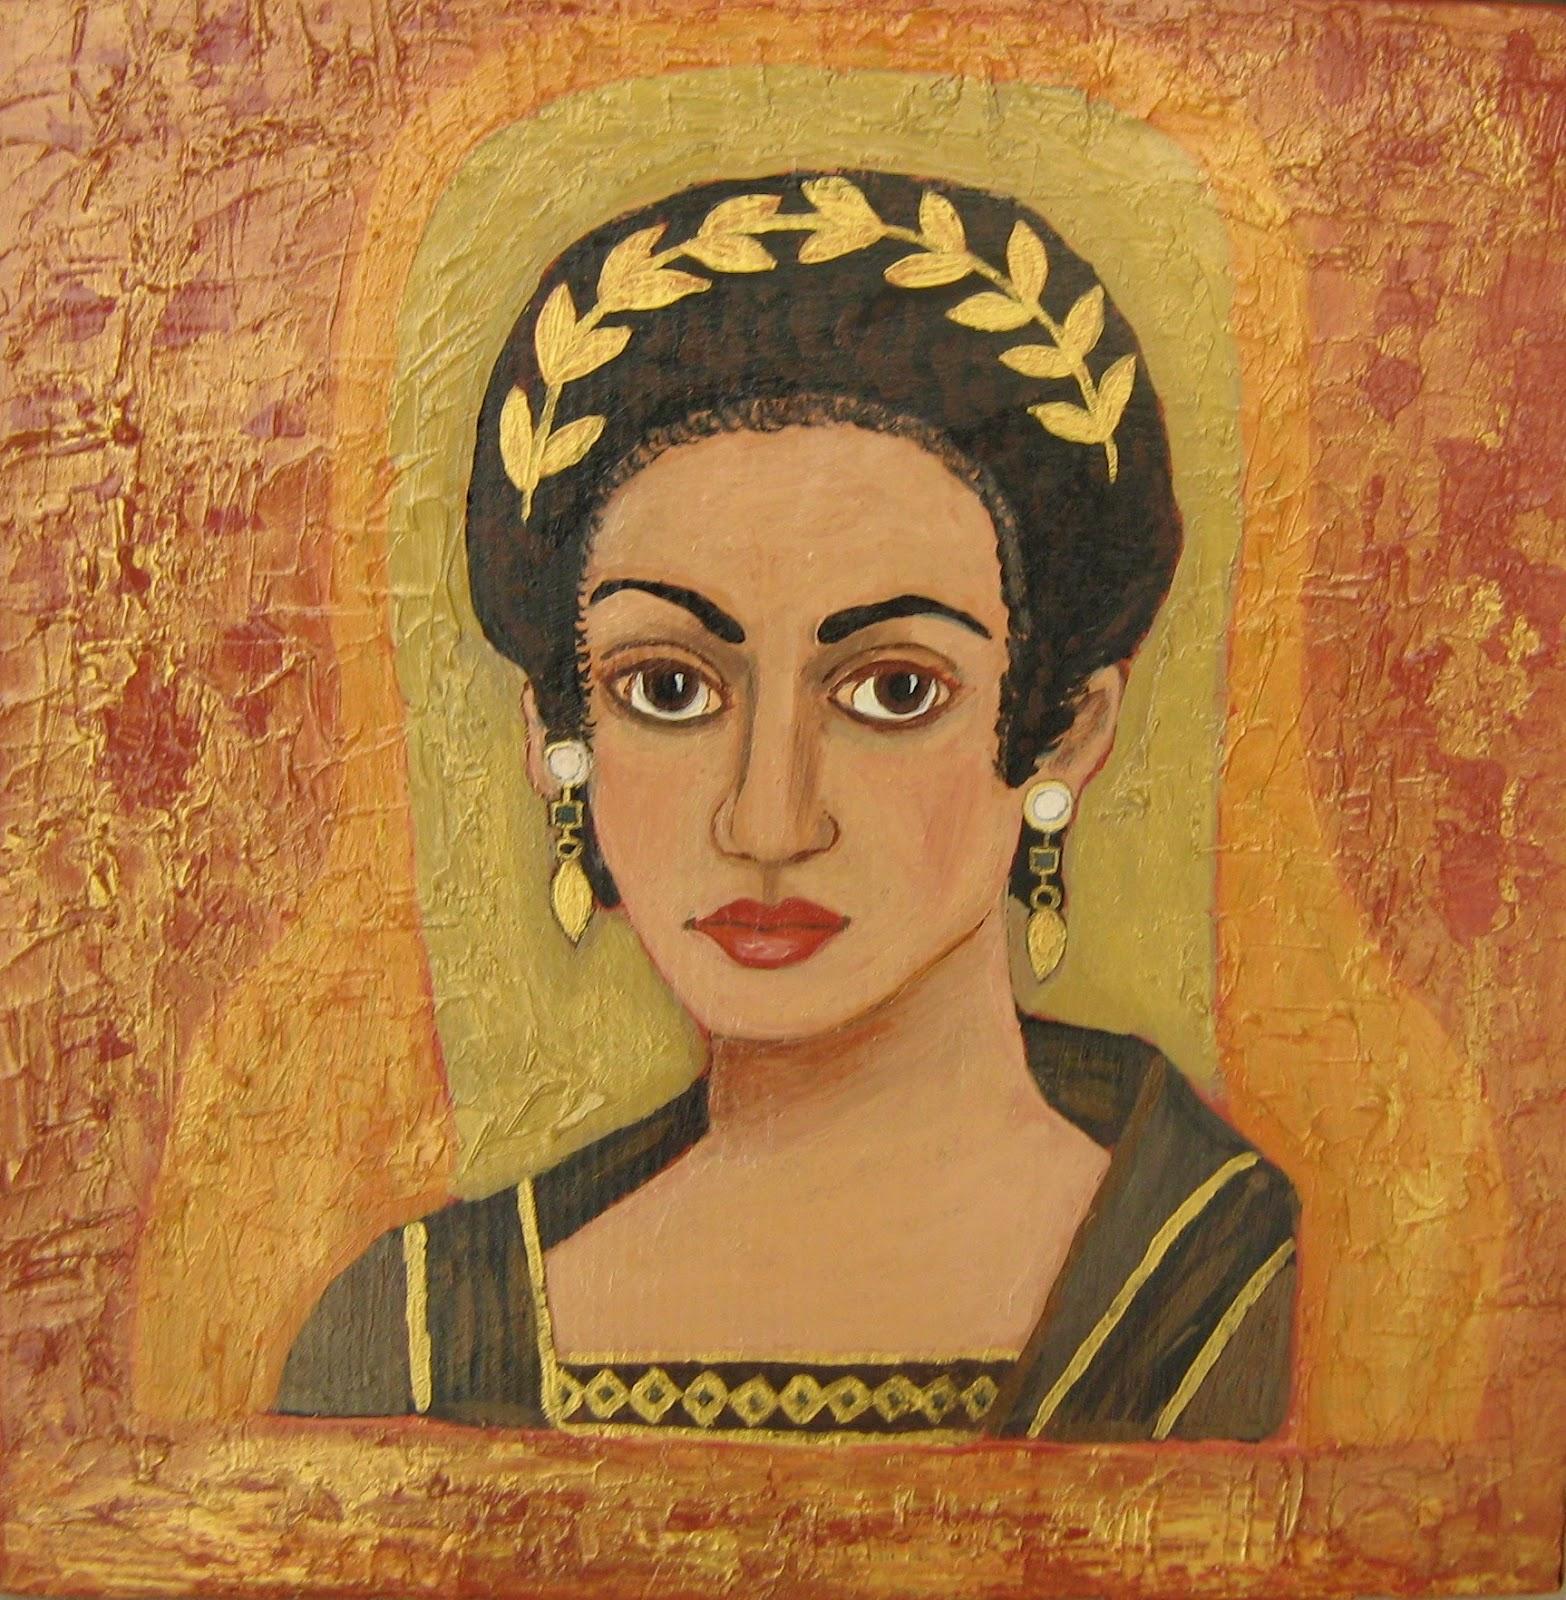 Fayioum portrait on ceramic